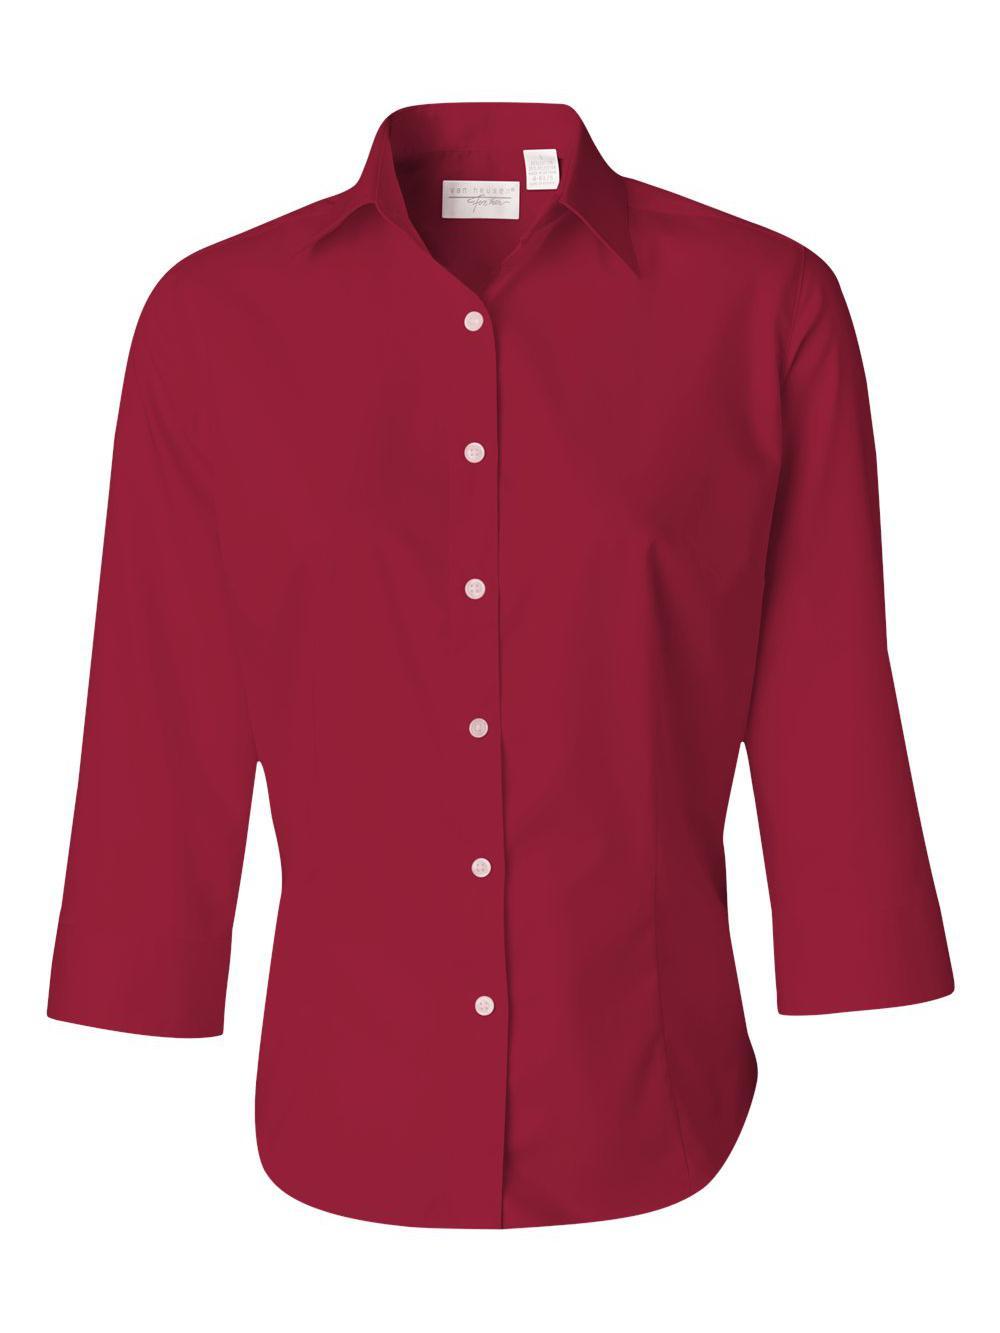 Van-Heusen-Women-039-s-Three-Quarter-Sleeve-Baby-Twill-Shirt-13V0527 thumbnail 15